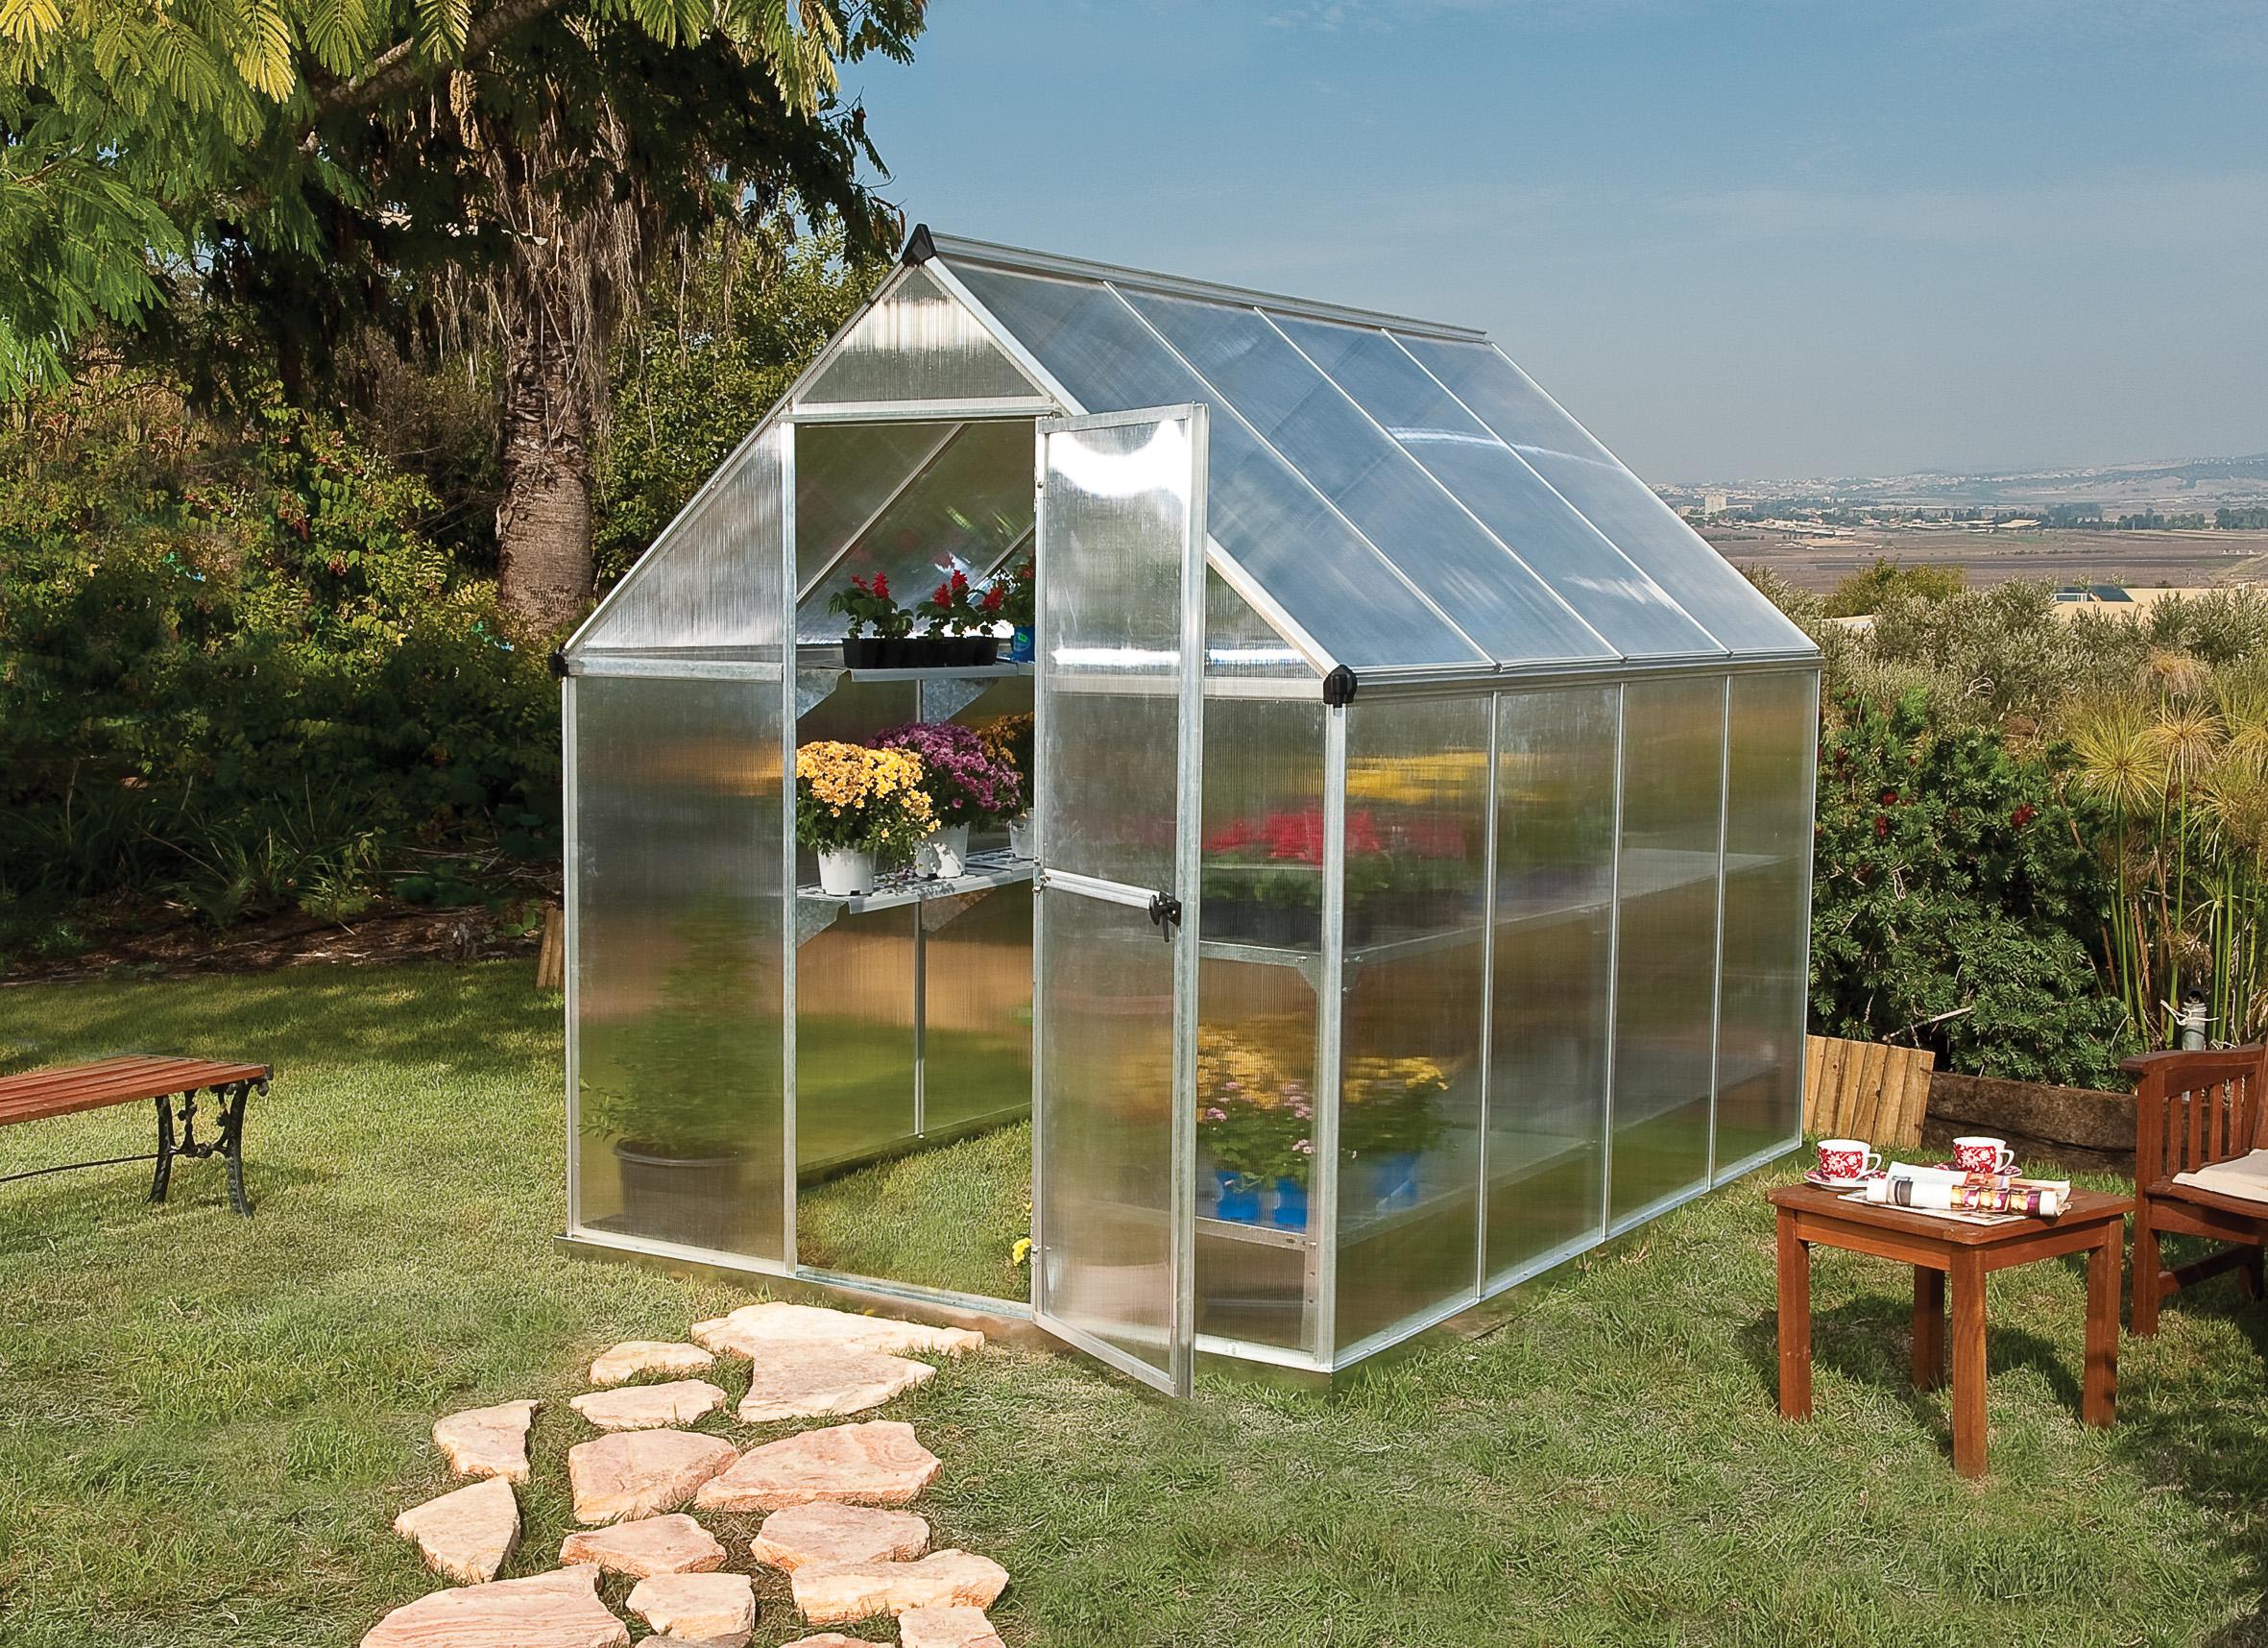 polykarbonátový skleník Palram multiline 6x8 + ZDARMA základna skleníku + ZDARMA automatický otvírač oken + hnojivo Biocin-FF + prodloužená ZÁRUKA 10 LET